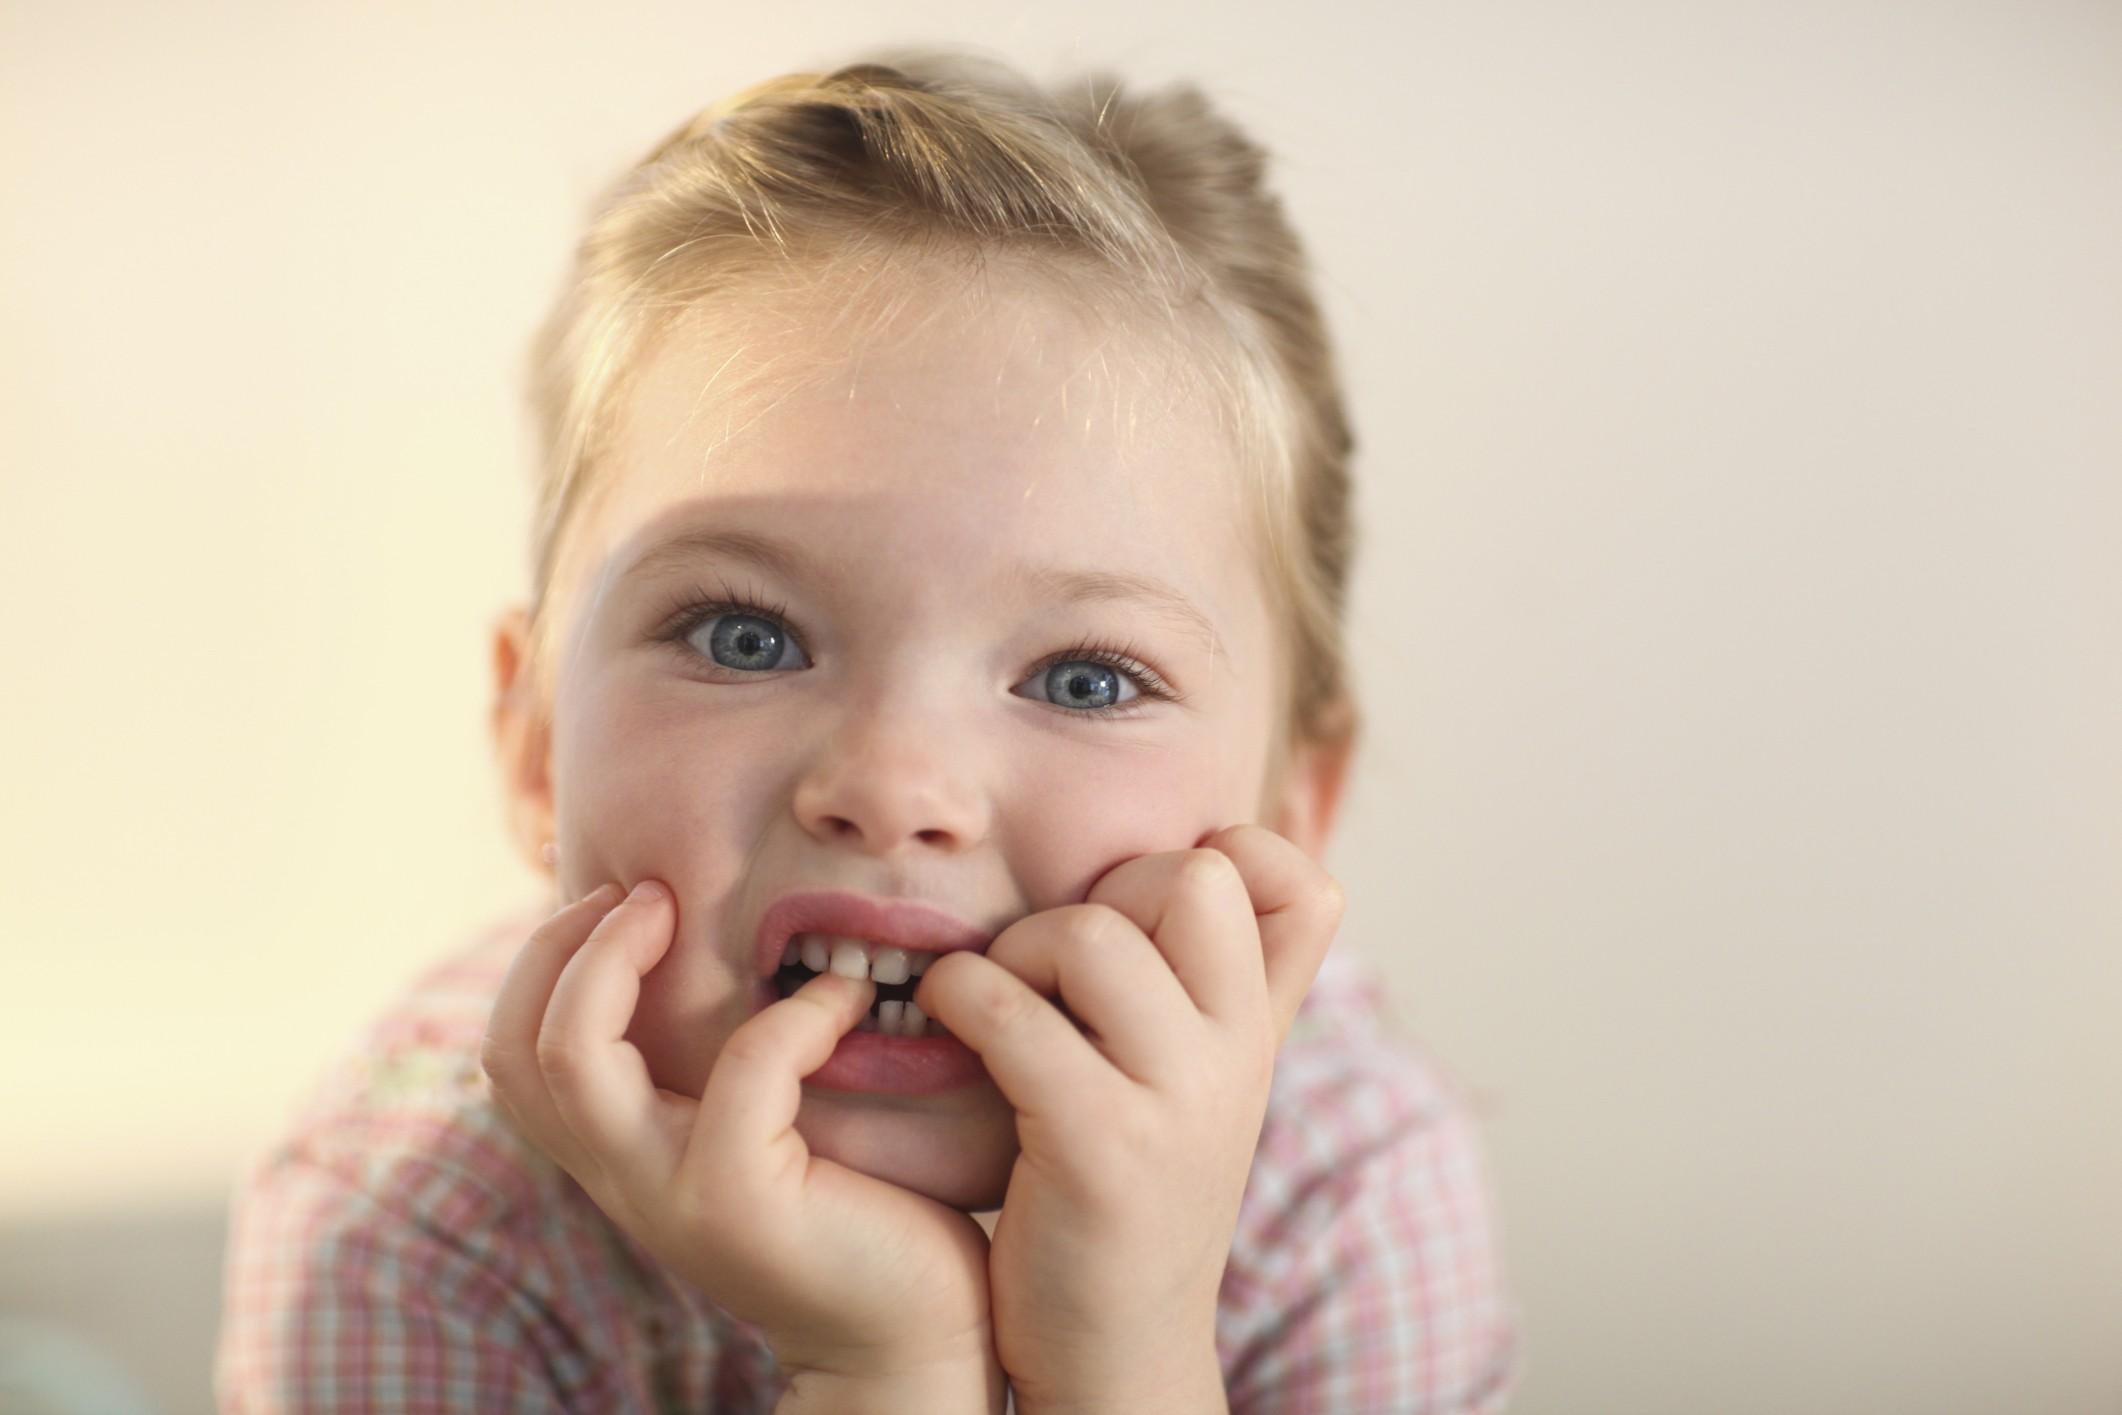 Seu filho também rói unhas? (Foto: Thinkstock)